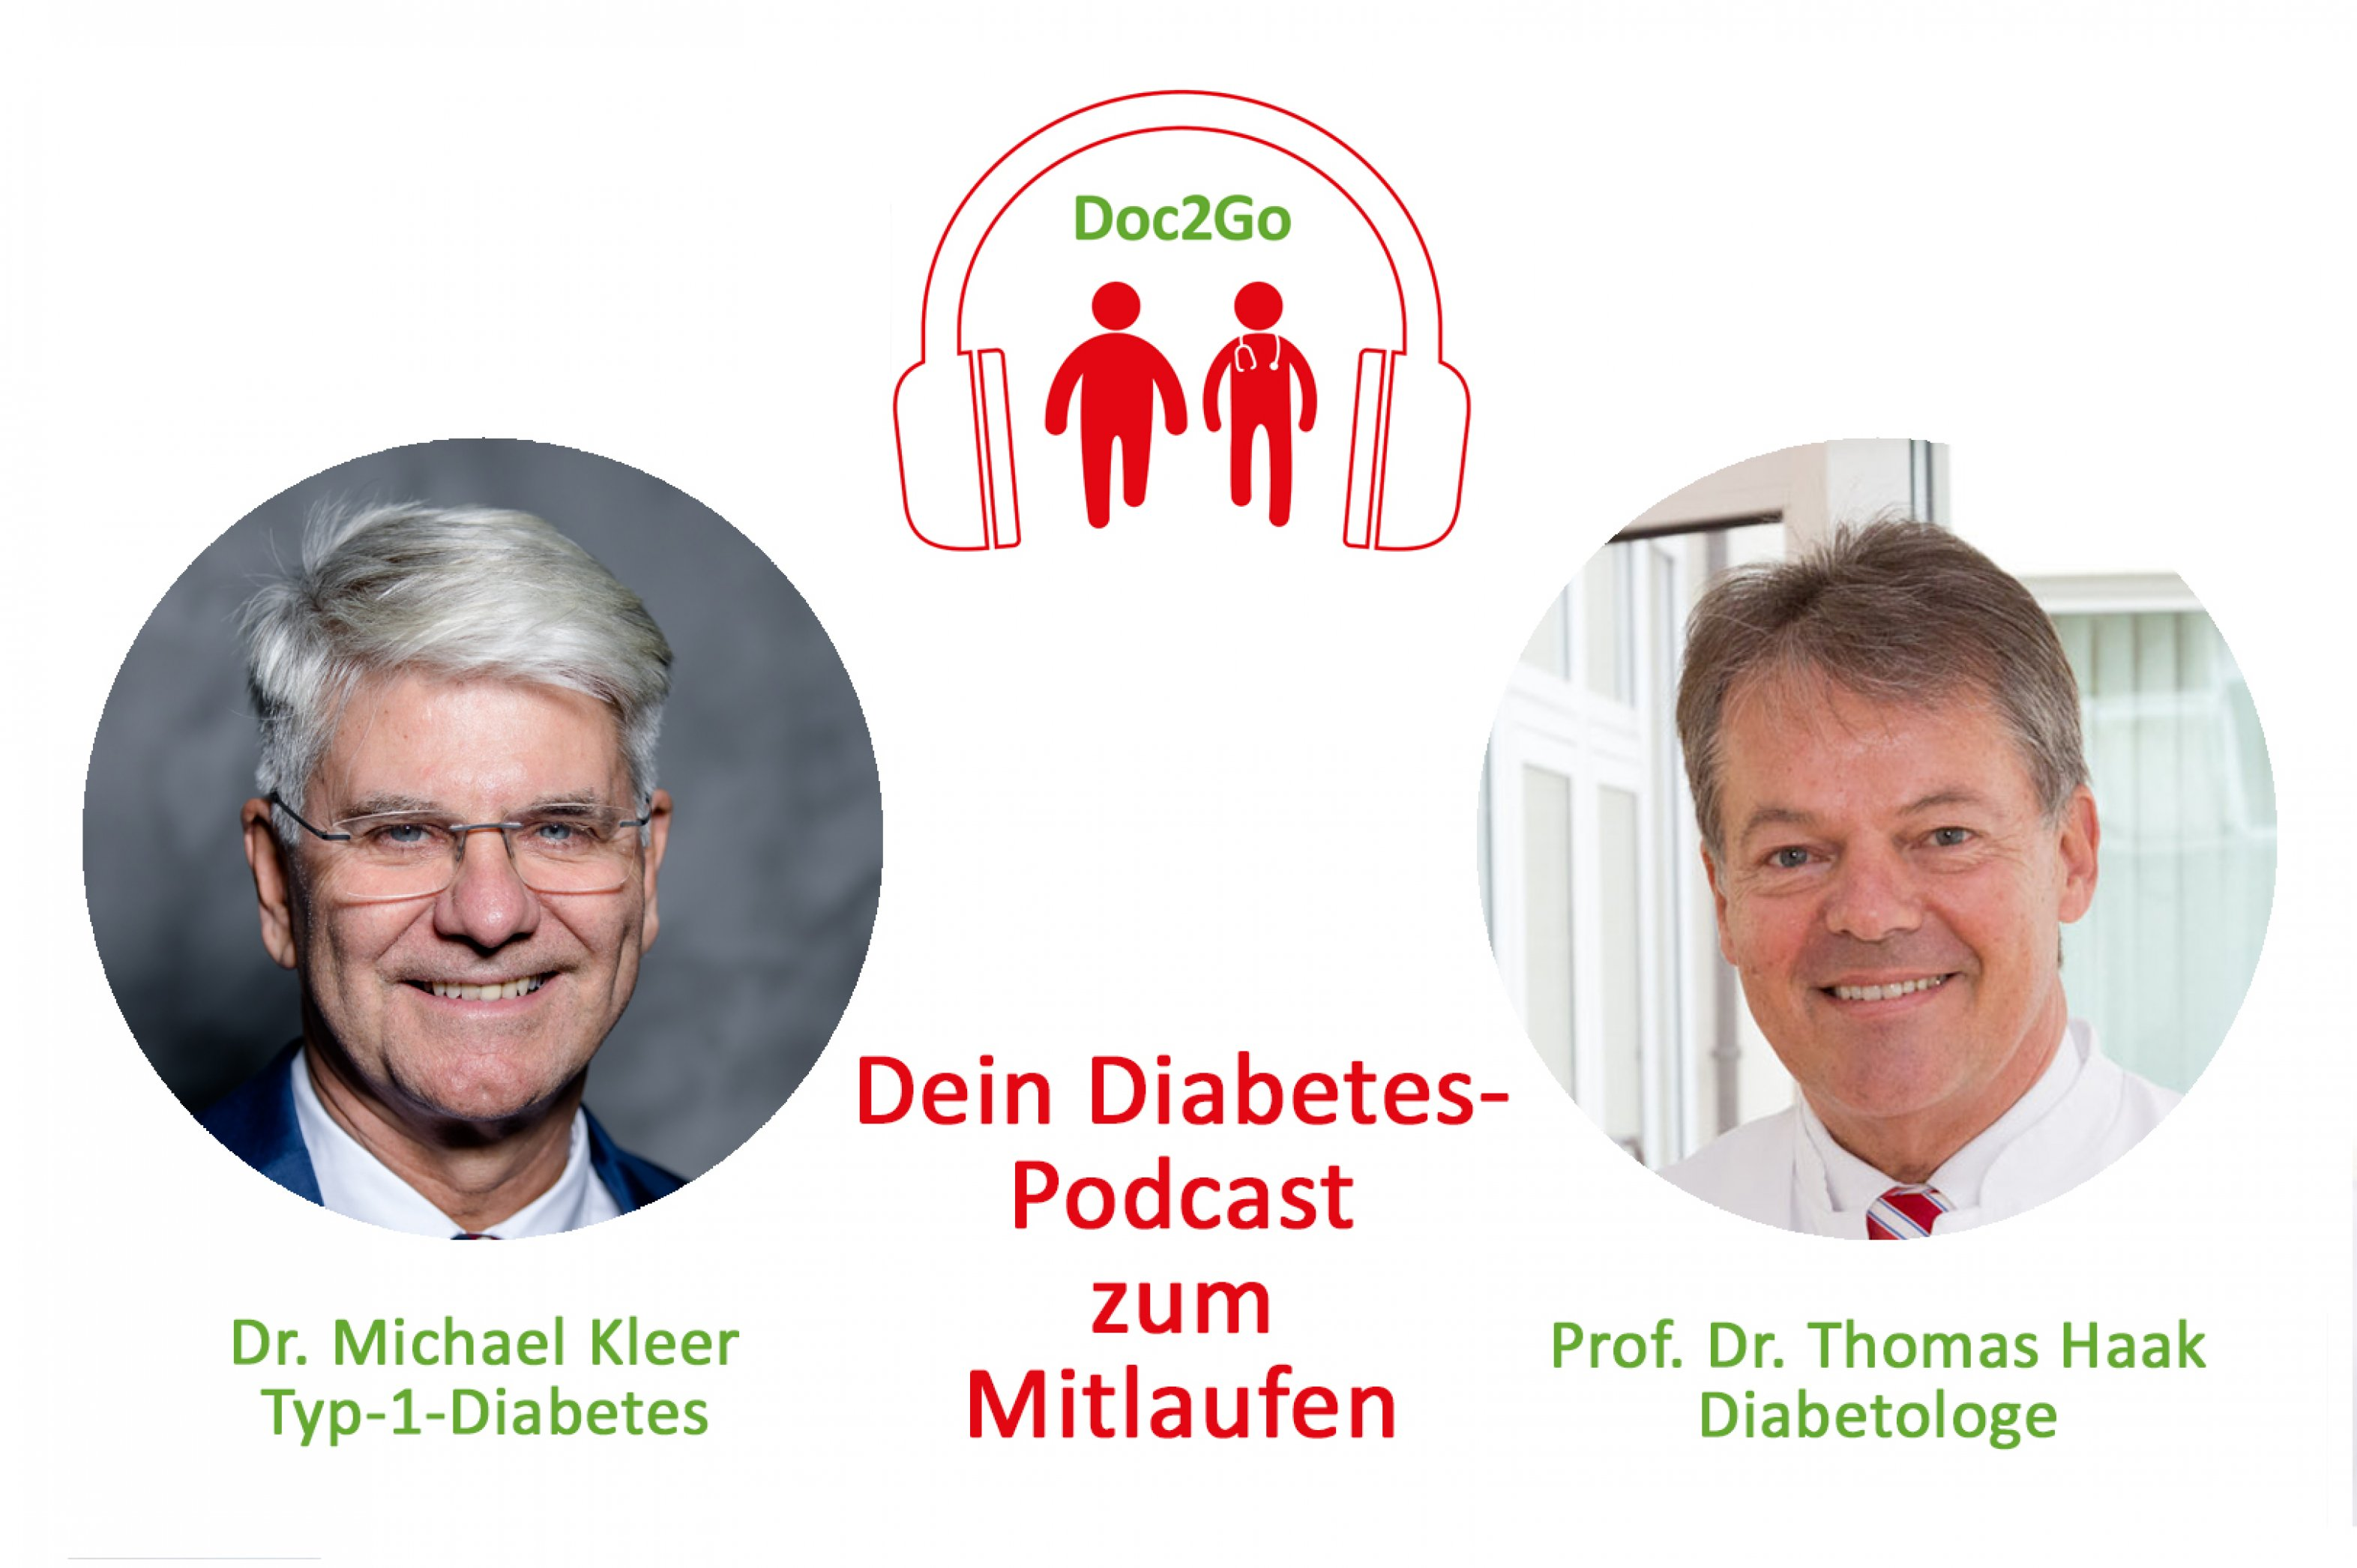 Podcast Doc2Go Staffel 2 Folge 2